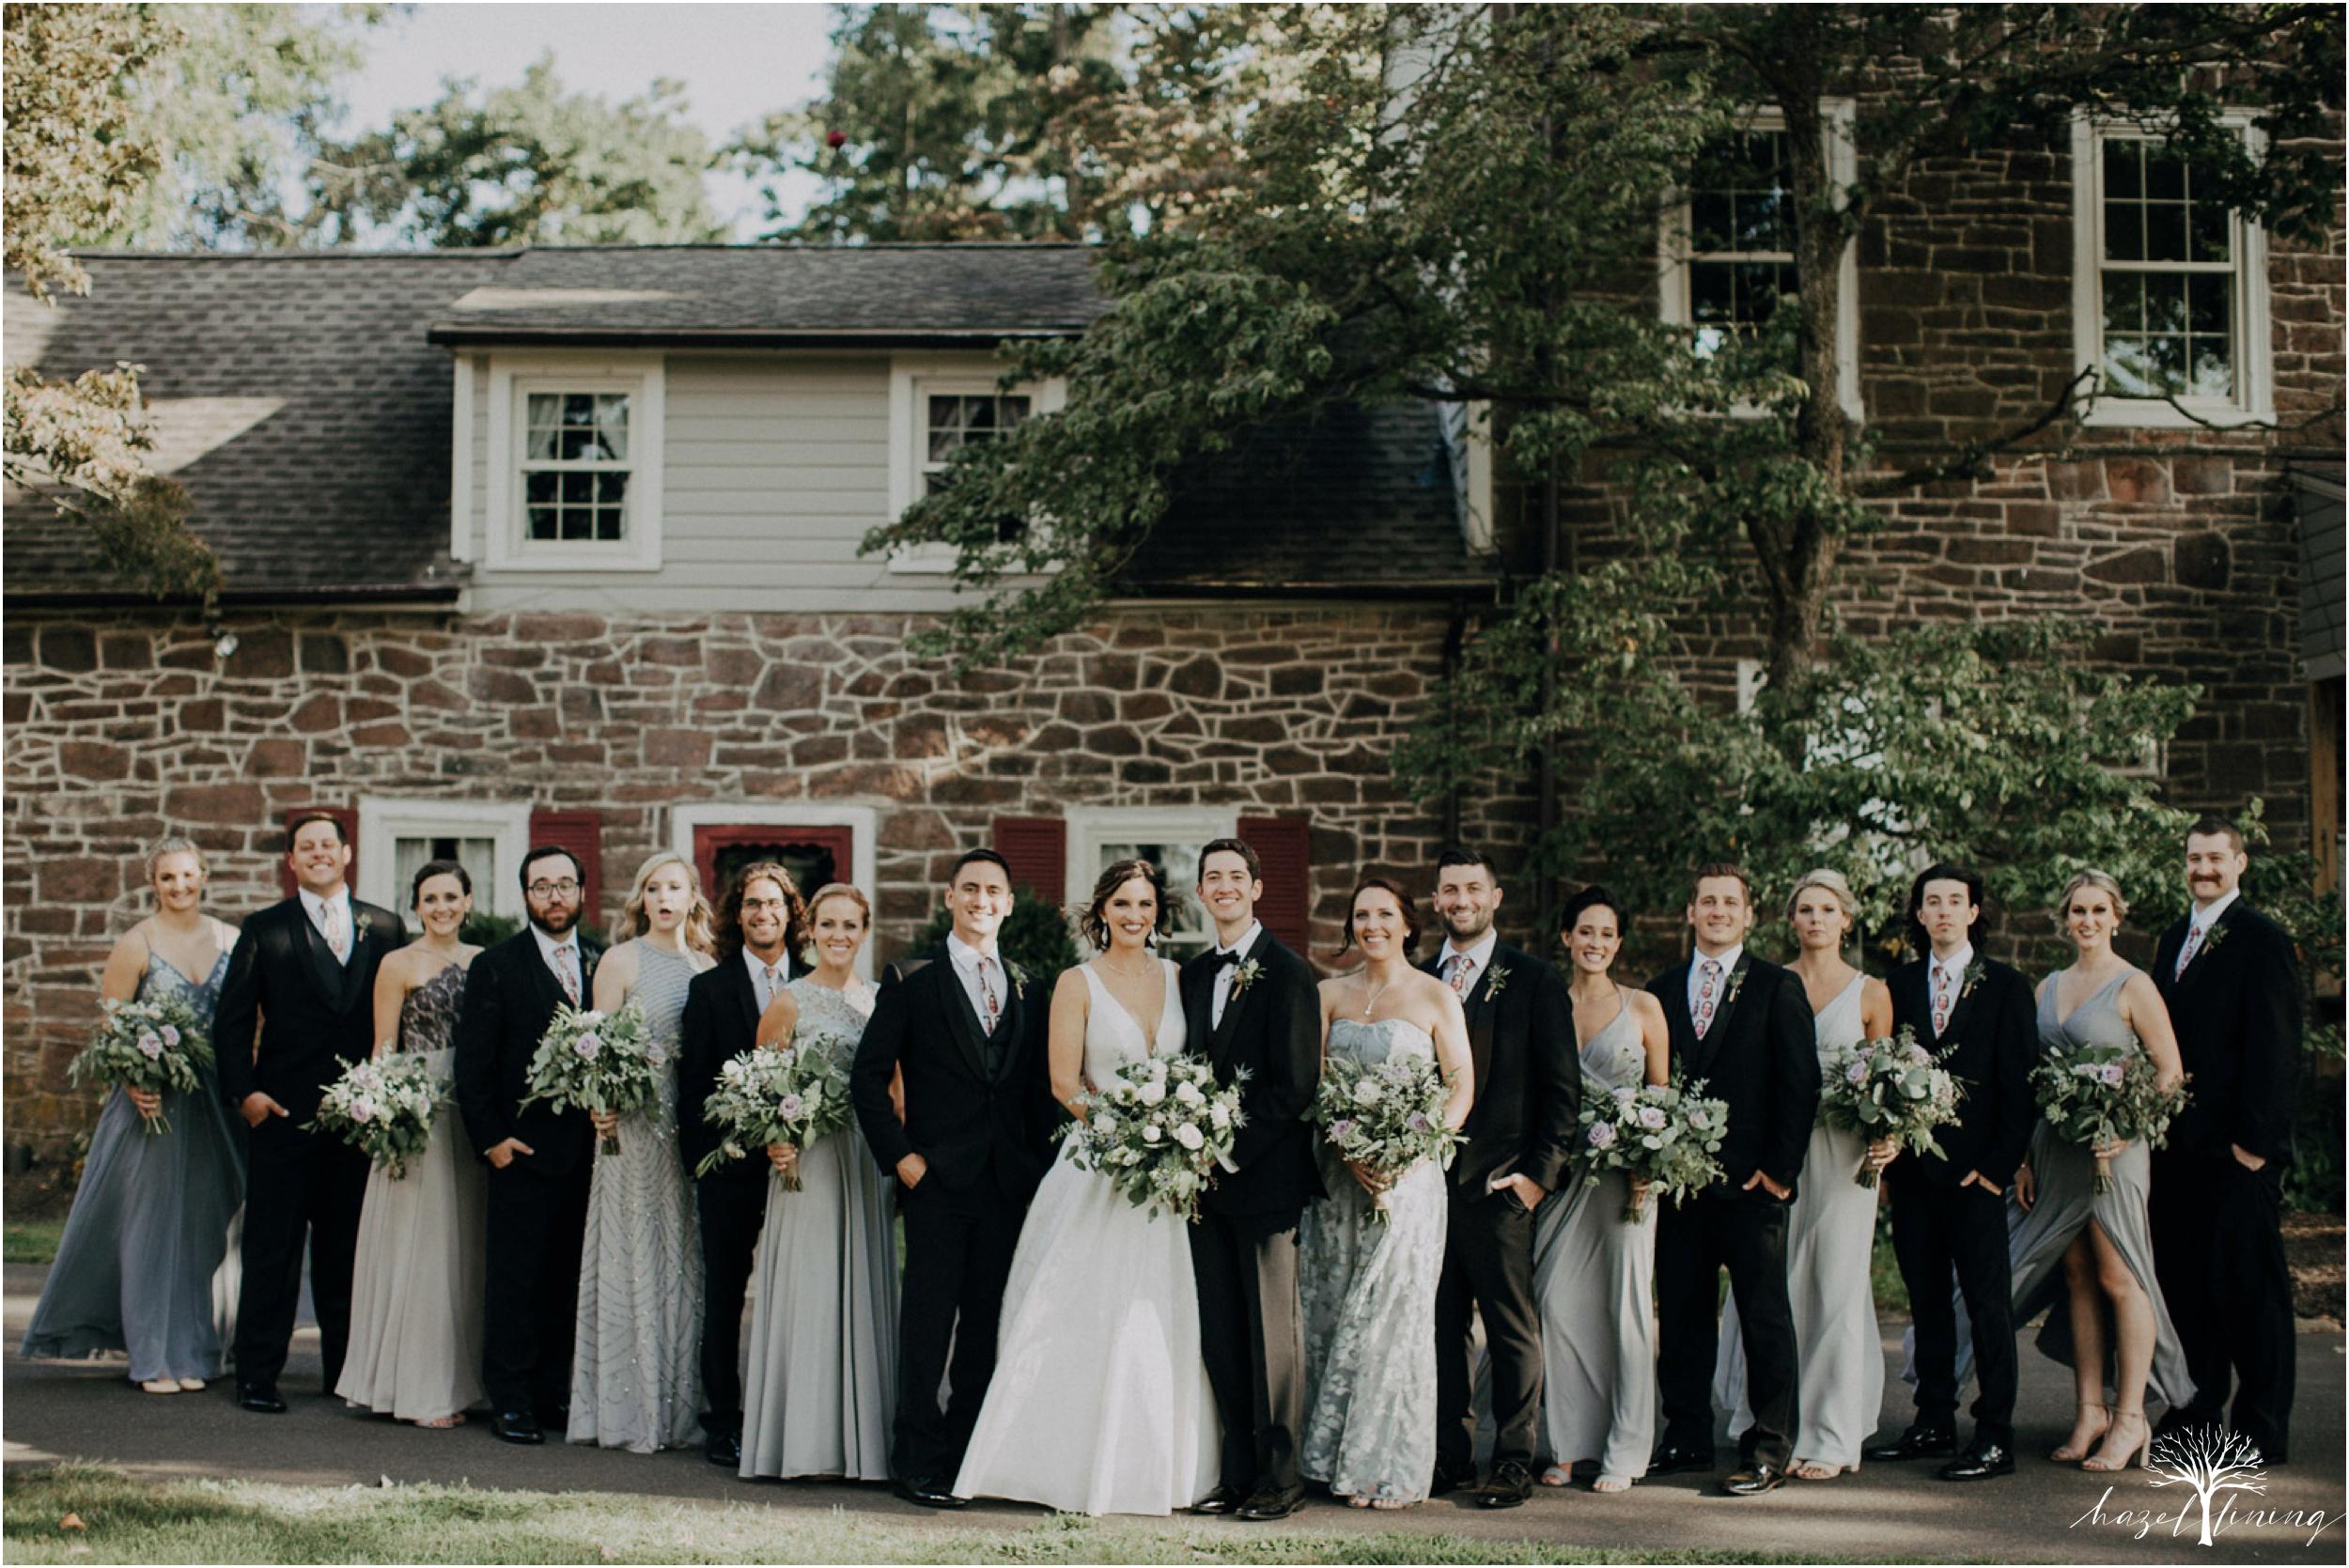 maureen-hepner-anthony-giordano-rose-bank-winery-newtow-pennsylvania-luxury-summer-wedding-hazel-lining-photography-destination-elopement-wedding-engagement-photography_0088.jpg